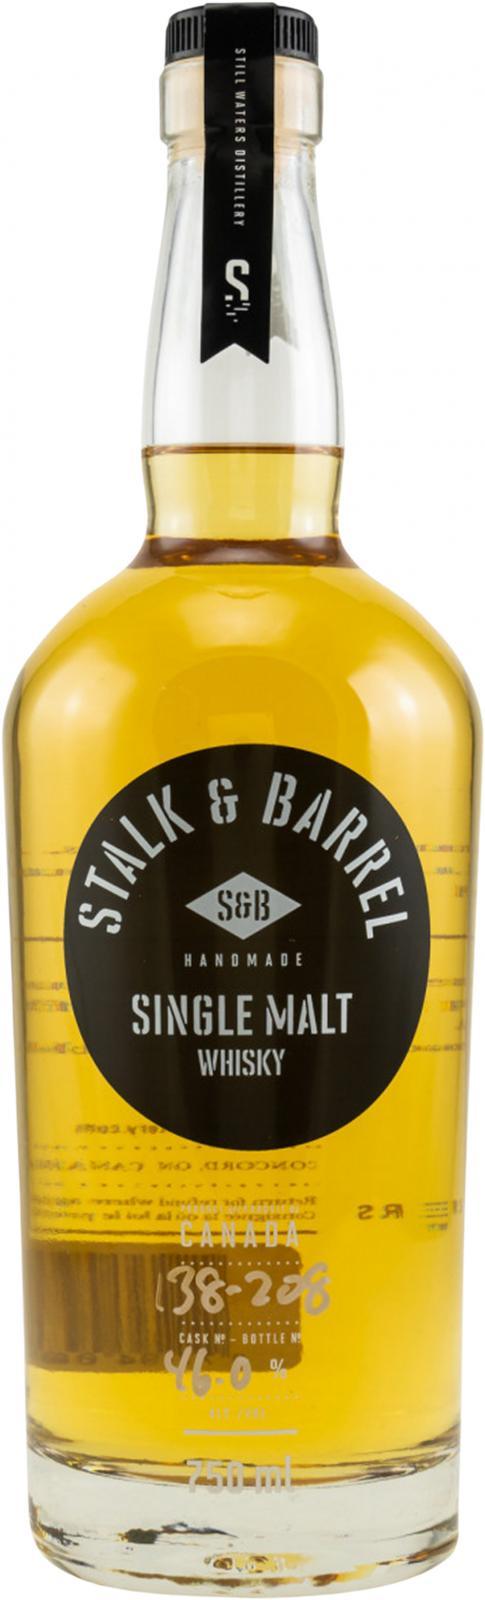 Stalk & Barrel Single Malt Whisky